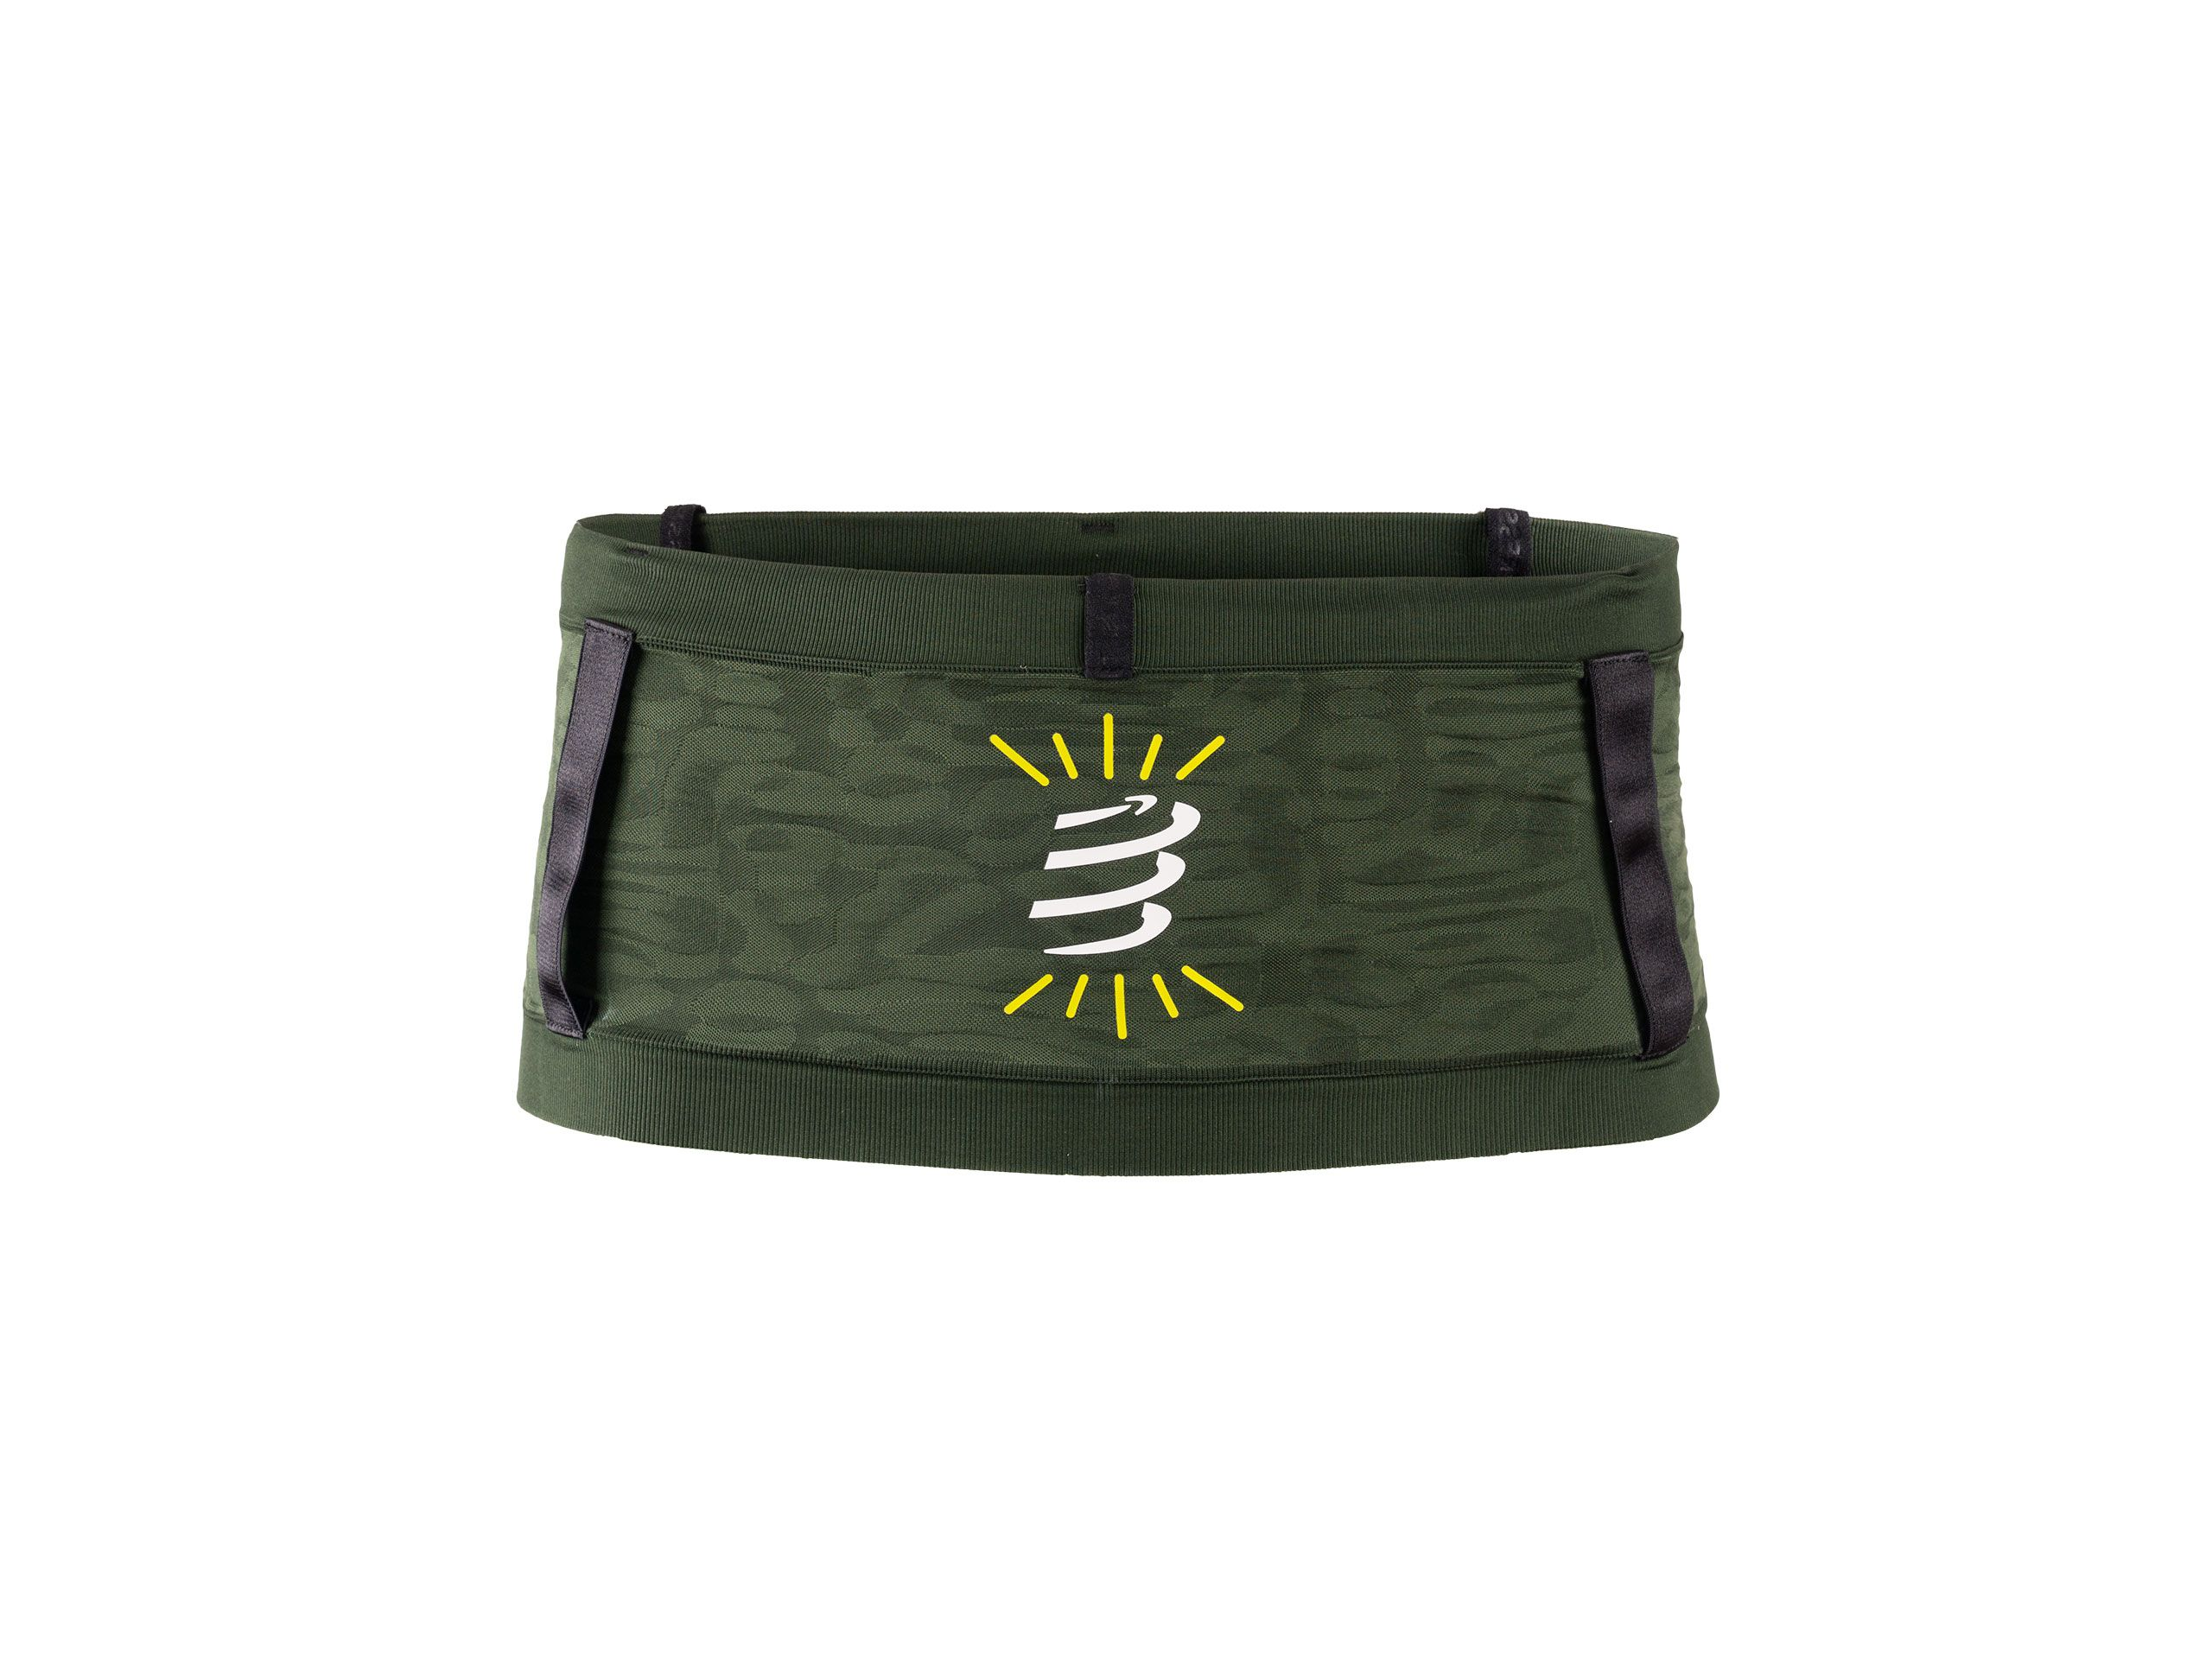 Free Belt - Camo Neon 2020